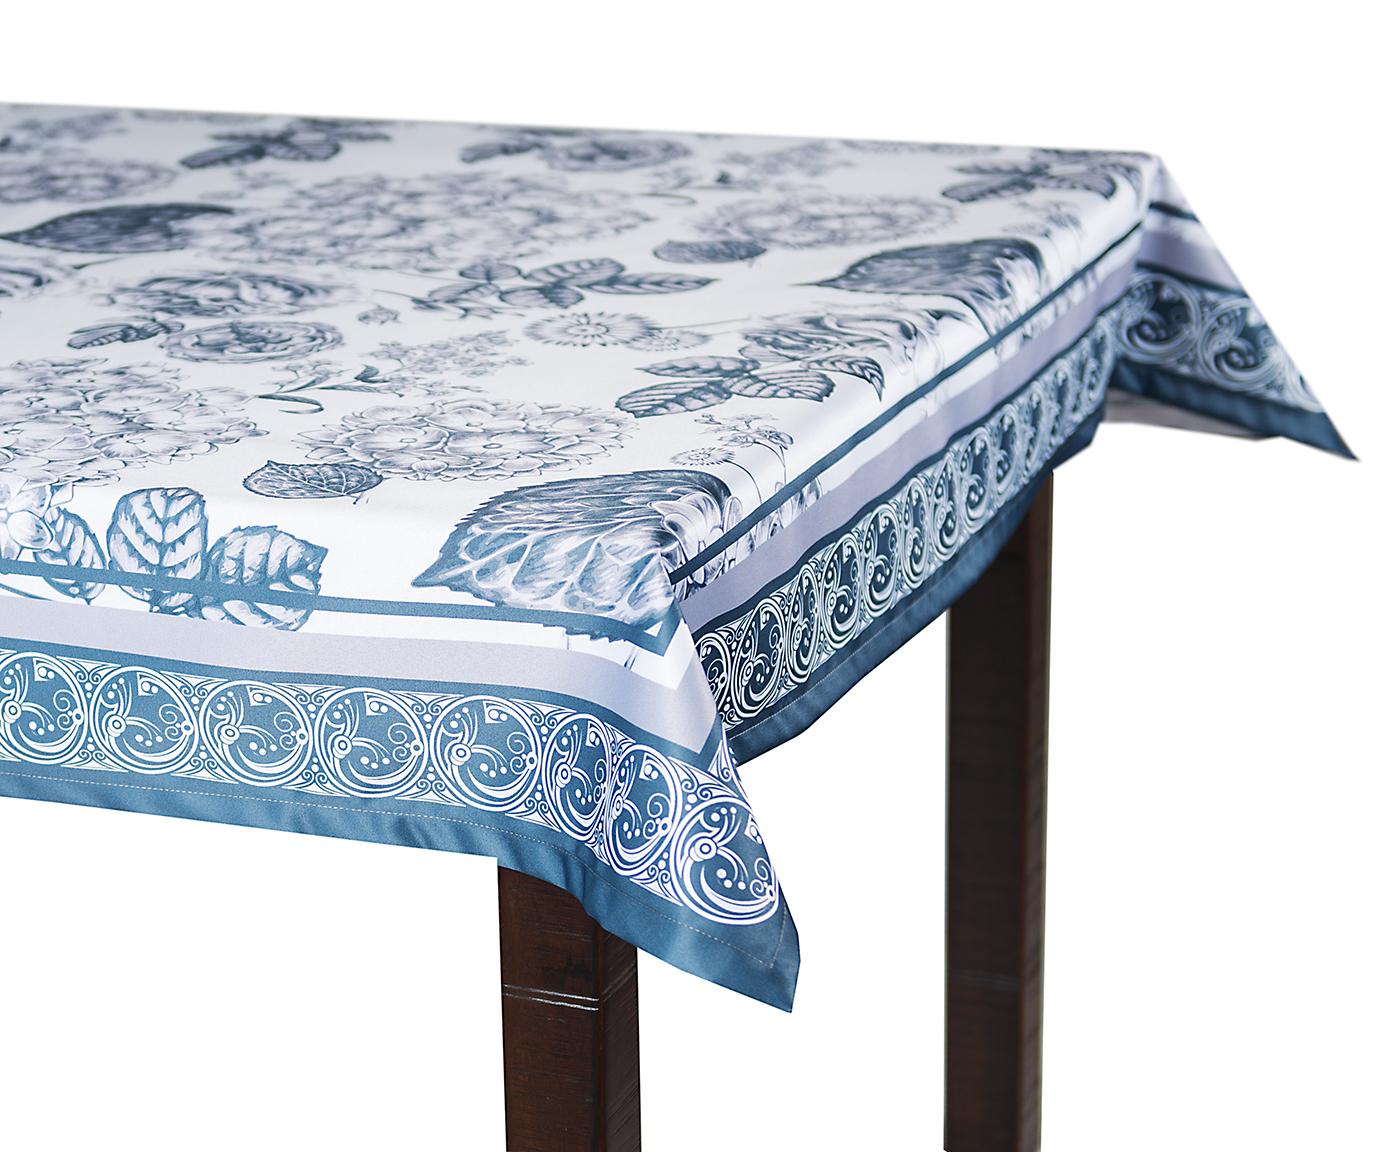 Кухня Скатерть 140x140 Blonder Home Sketchbook синяя skatert-140x140-blonder-home-sketchbook-sinyaya-ssha-rossiya.jpg